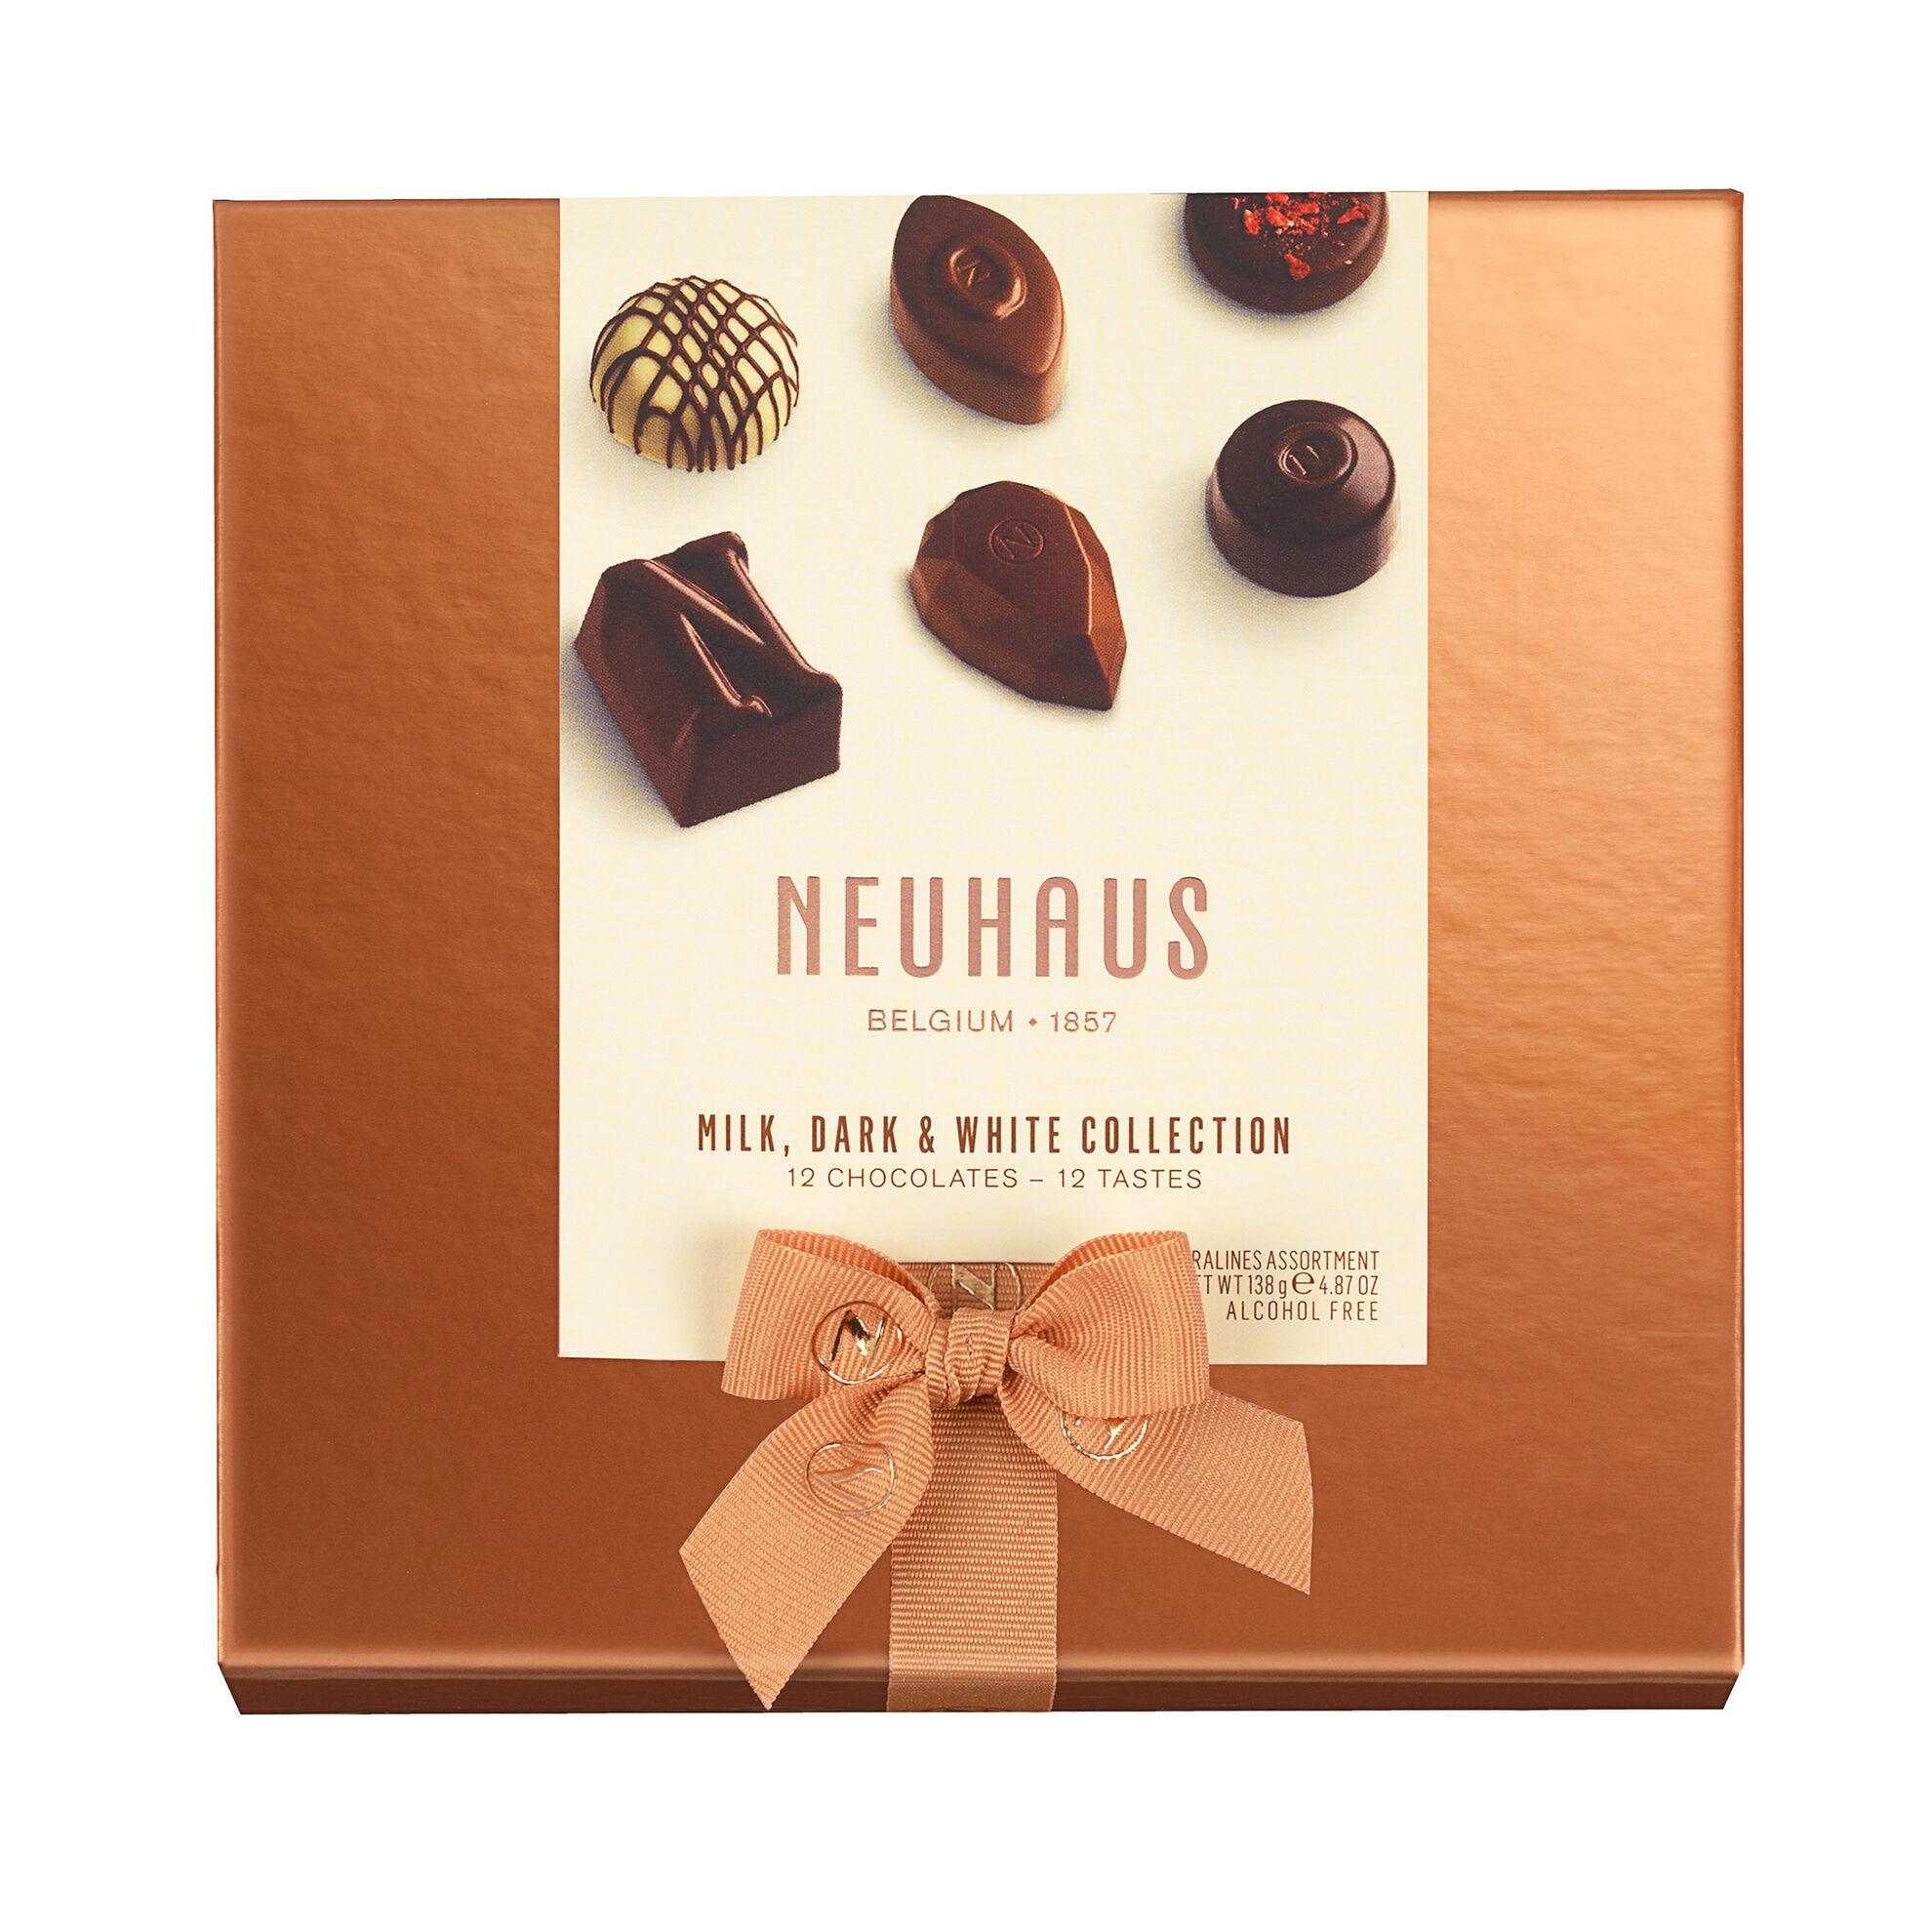 Neuhaus Discovery Collection: Milk, Dark, White Chocolate Assortment 12 pcs image number 11